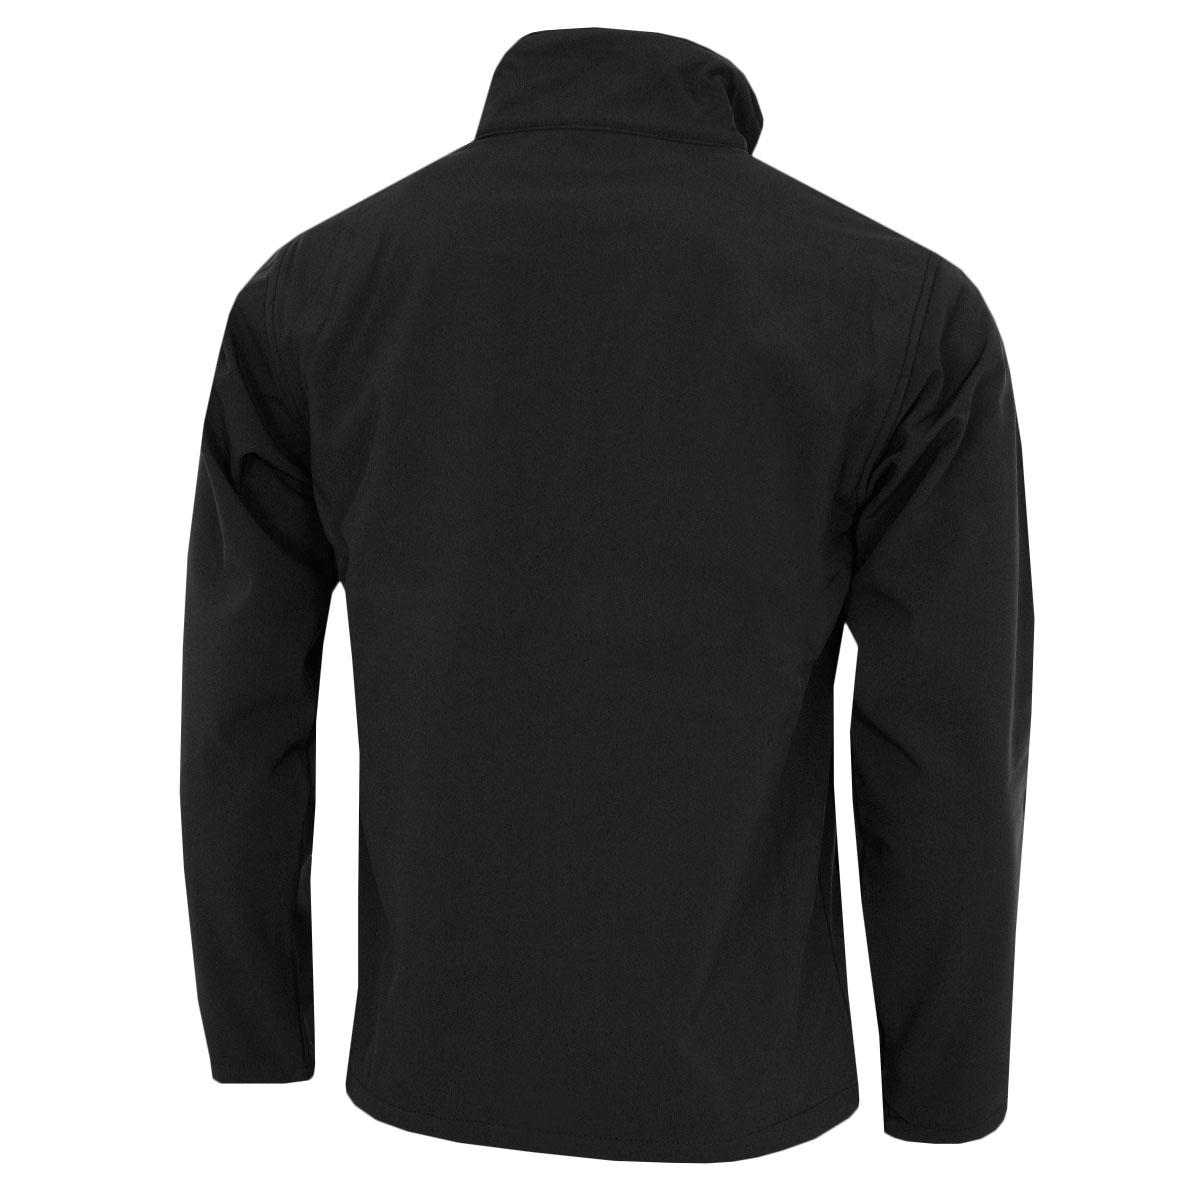 Regatta-Mens-Void-Softshell-Water-Repellent-Windproof-Jacket-60-OFF-RRP thumbnail 3